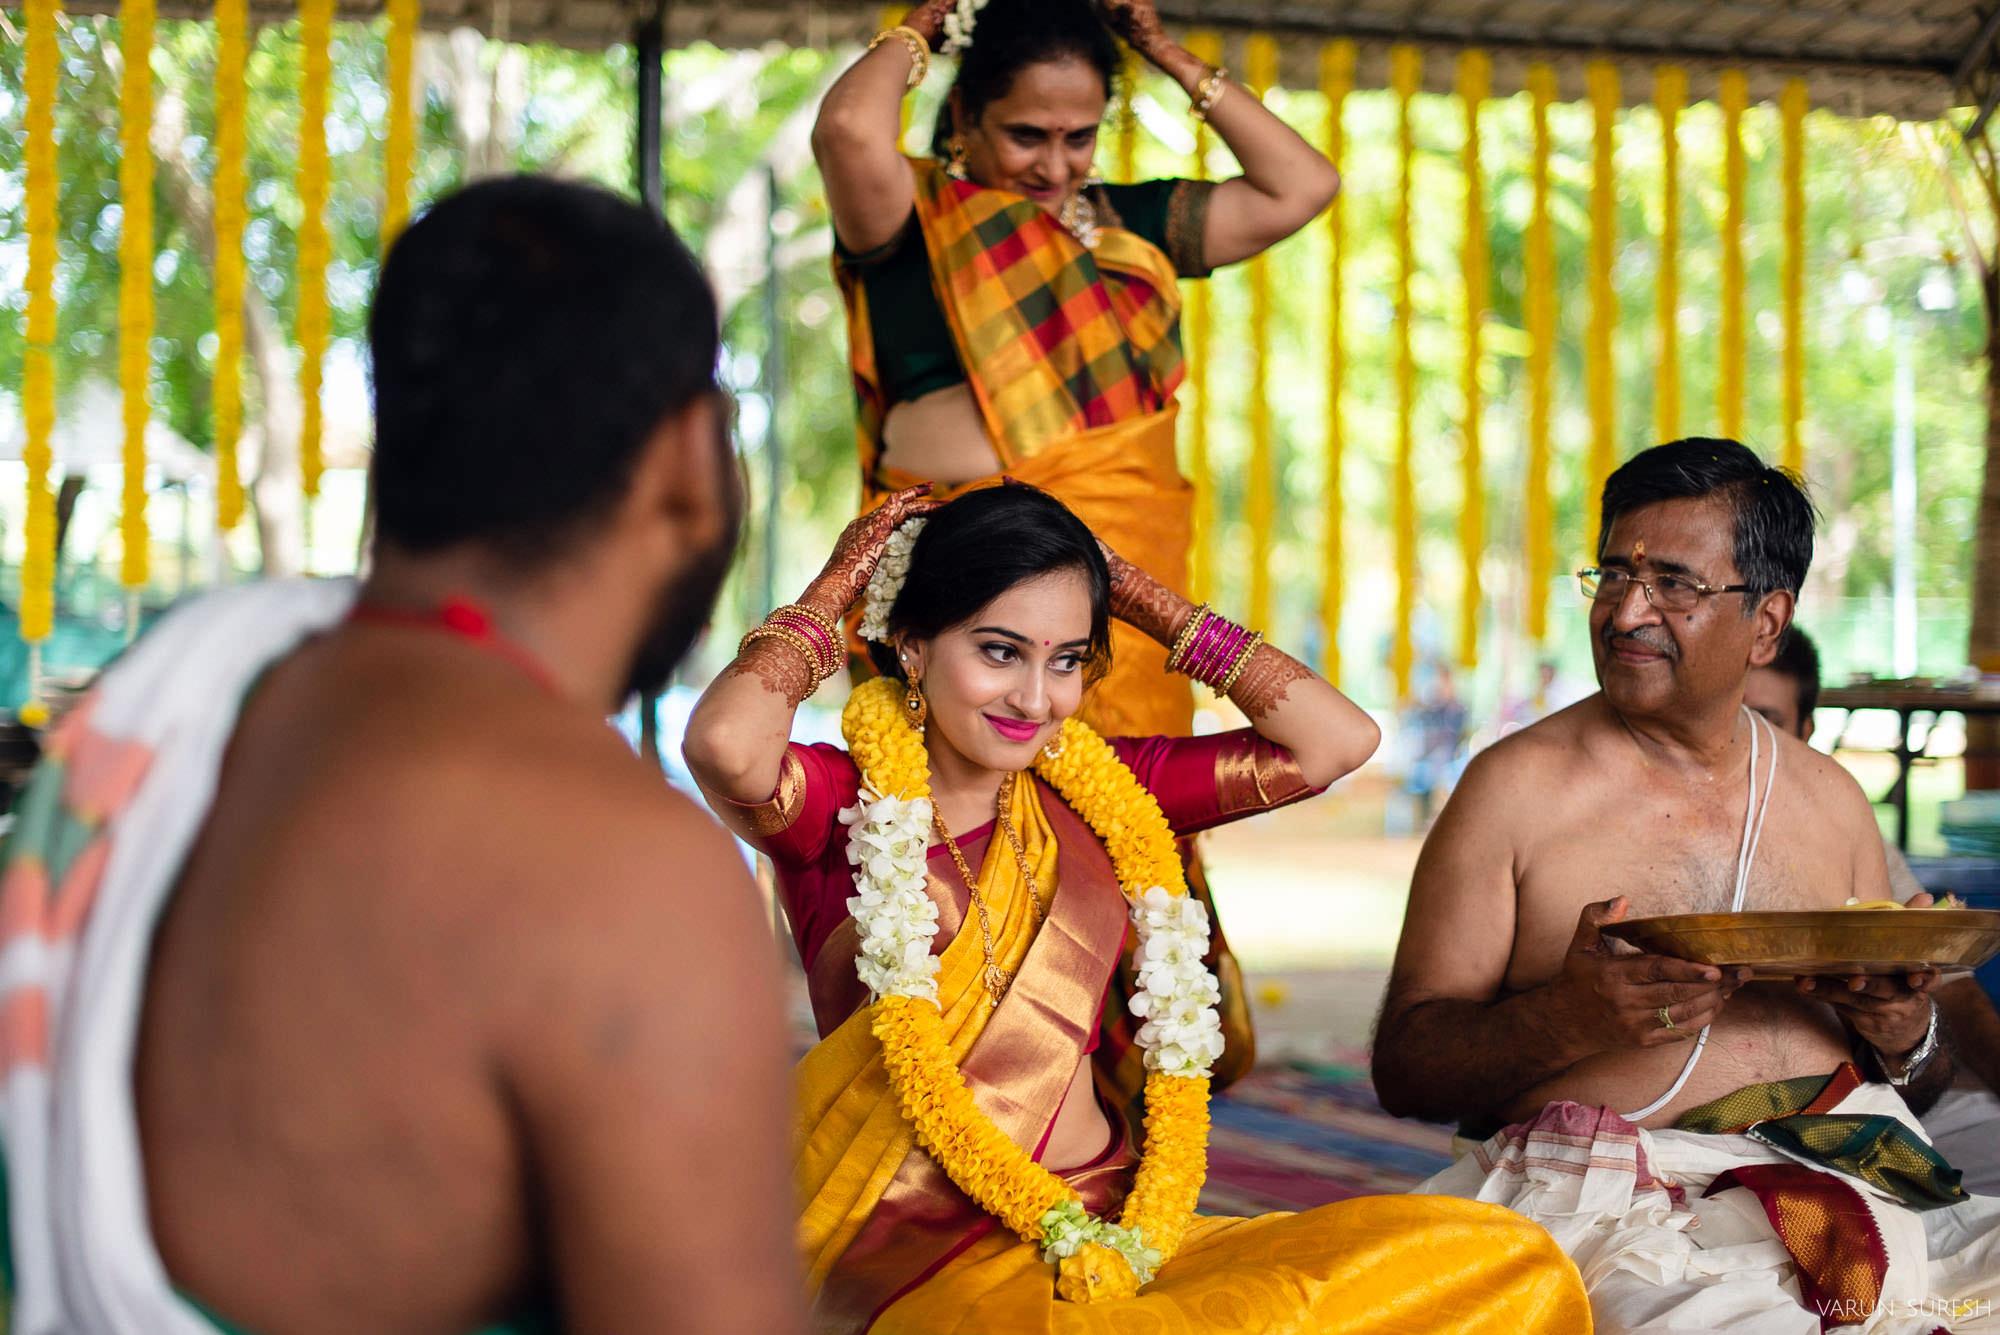 Anjanah_Aditya_60.jpg